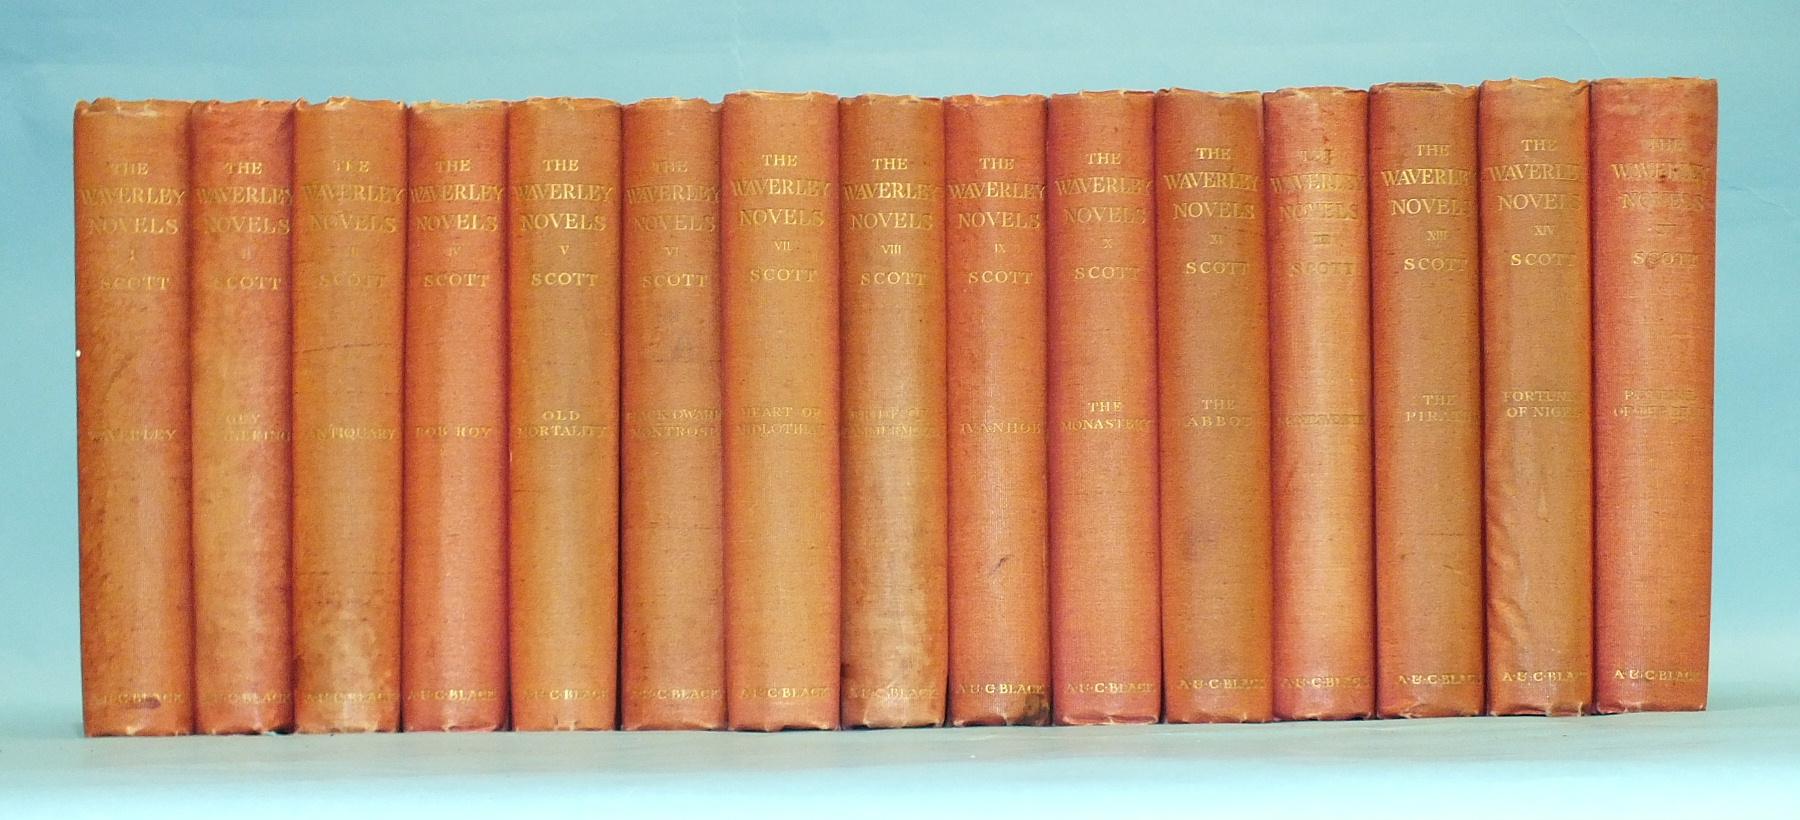 Scott (Sir Walter), Waverley Novels, 15 vols, cl gt, 8vo, Adam & Charles Black, 1902 and other